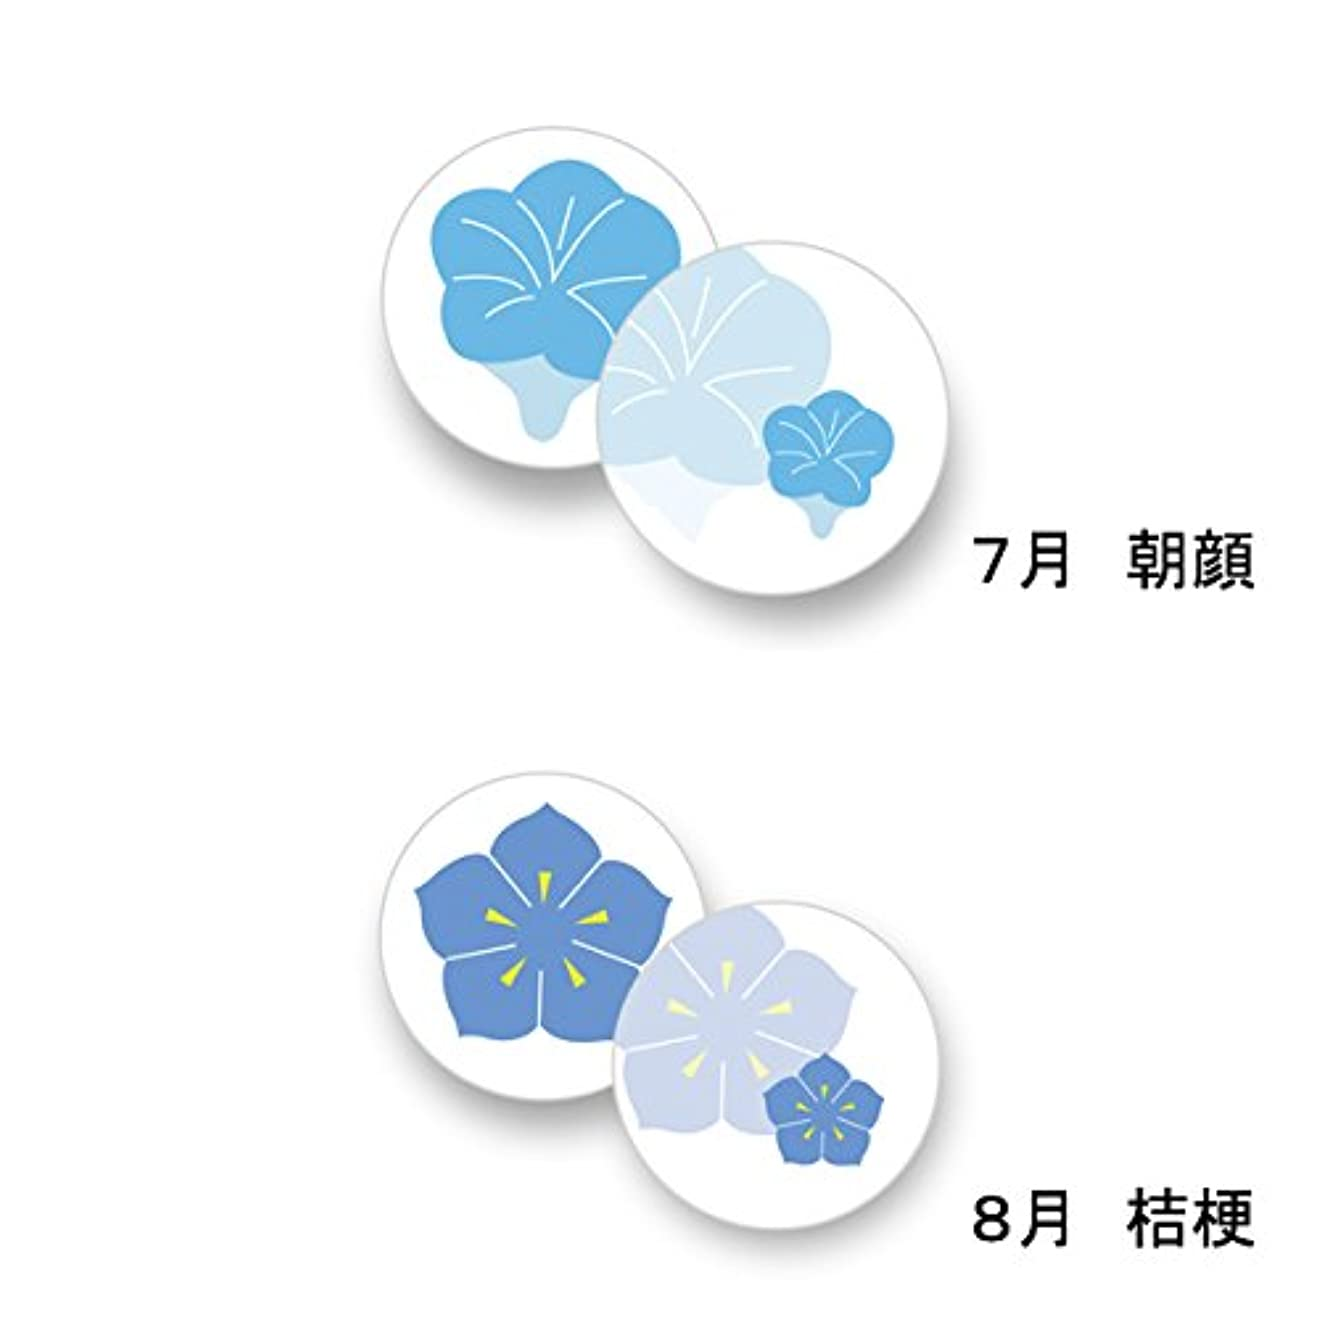 渦違反する意欲花京香 文香 1月~12月 (7月(朝顔))